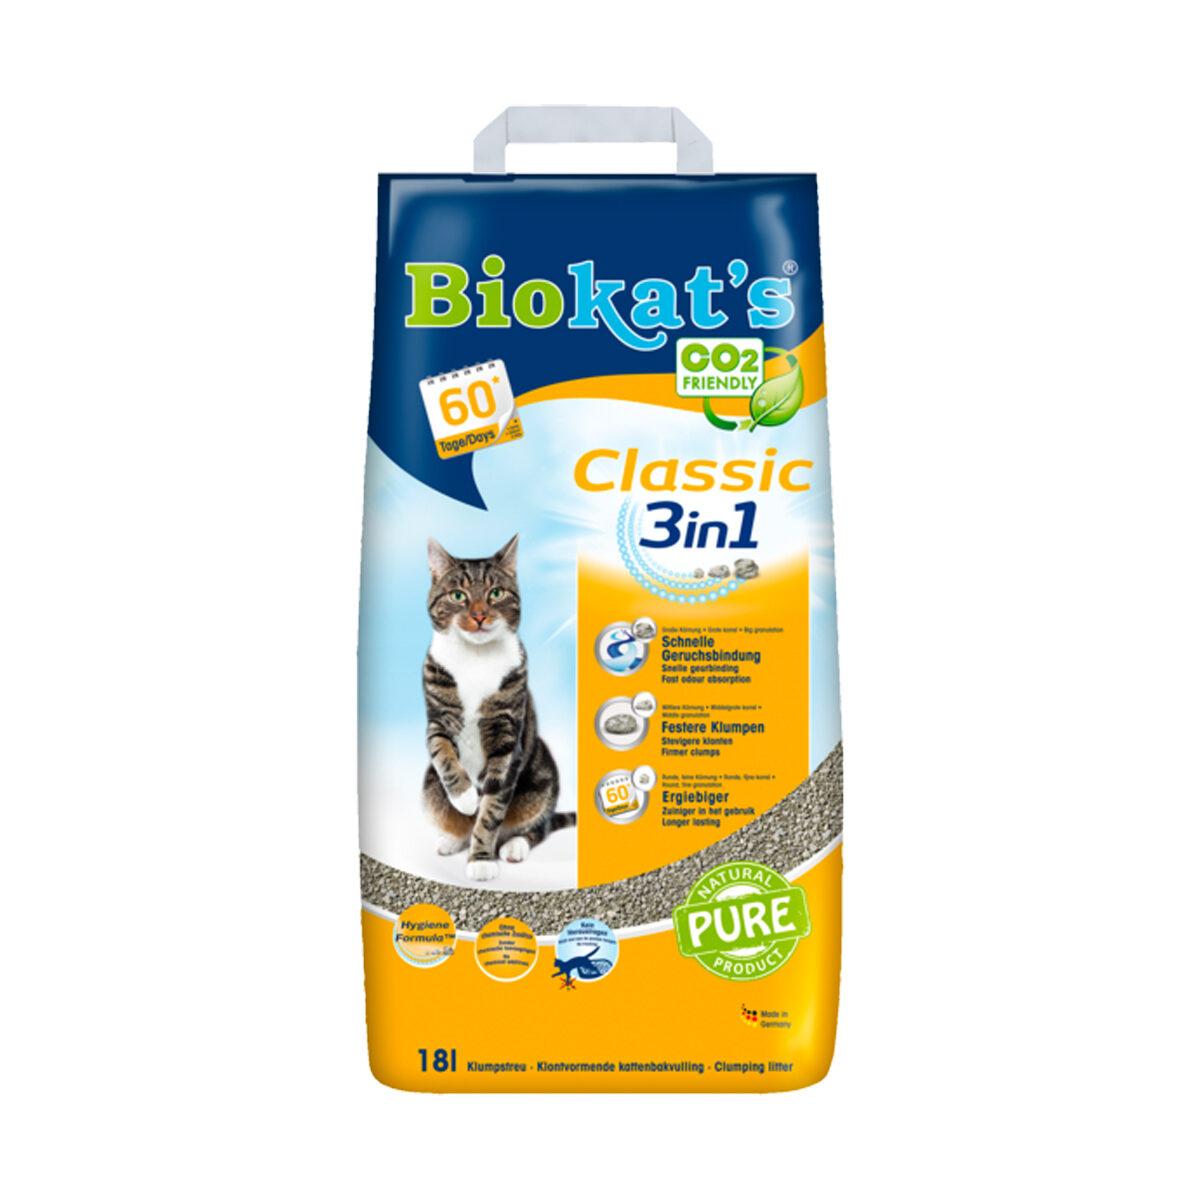 biokats-classic